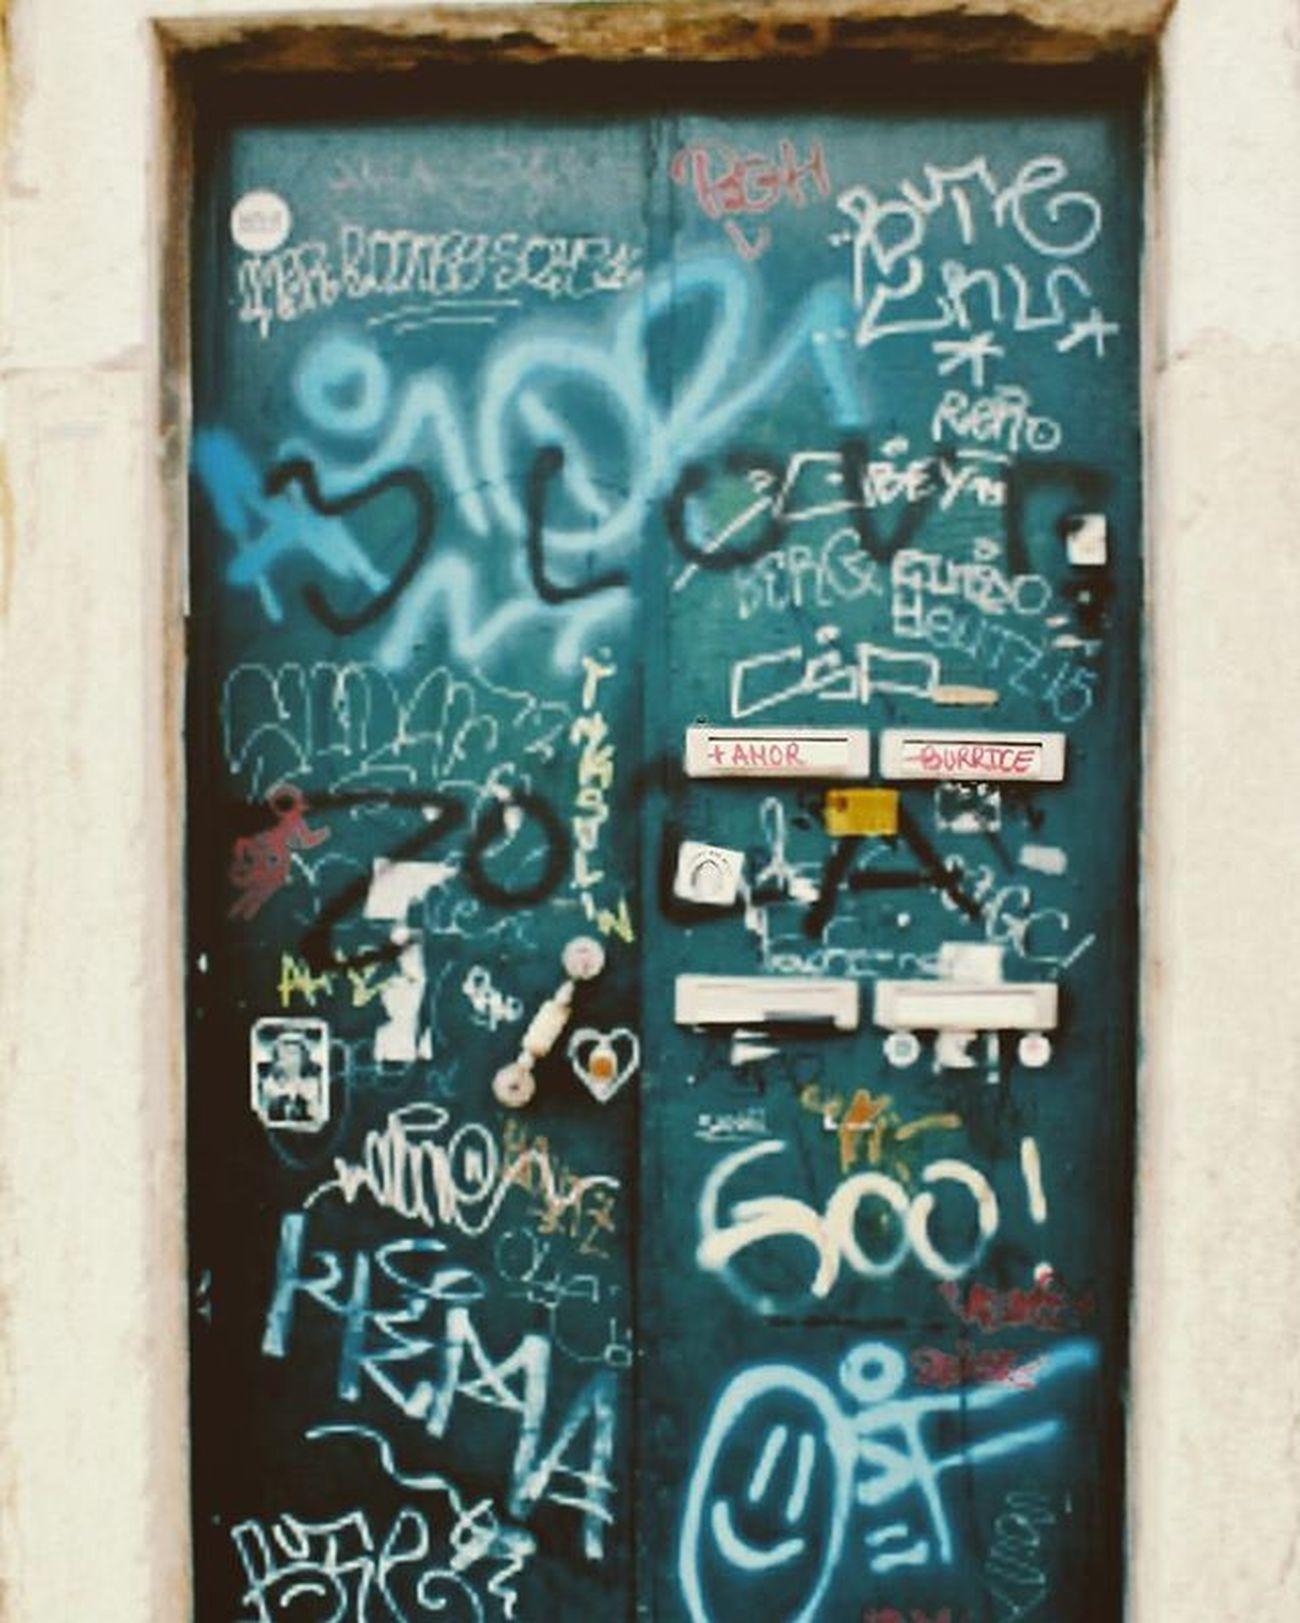 +amor -burrice Portugallovers Portugaloteuolhar Portugaldenorteasul Portugalcomefeitos Super_lisboa Super_portugal Faded_world Faded_portugal VSCAM P3top Takeoverinspiration Lisboalovers Lisboaconvida Lisboalive Storybehindsquares Behindthescenes Yoursquarehere Uniplacesliving Bomregisto Igers Igerslx Igersportugal Graffitilisbon